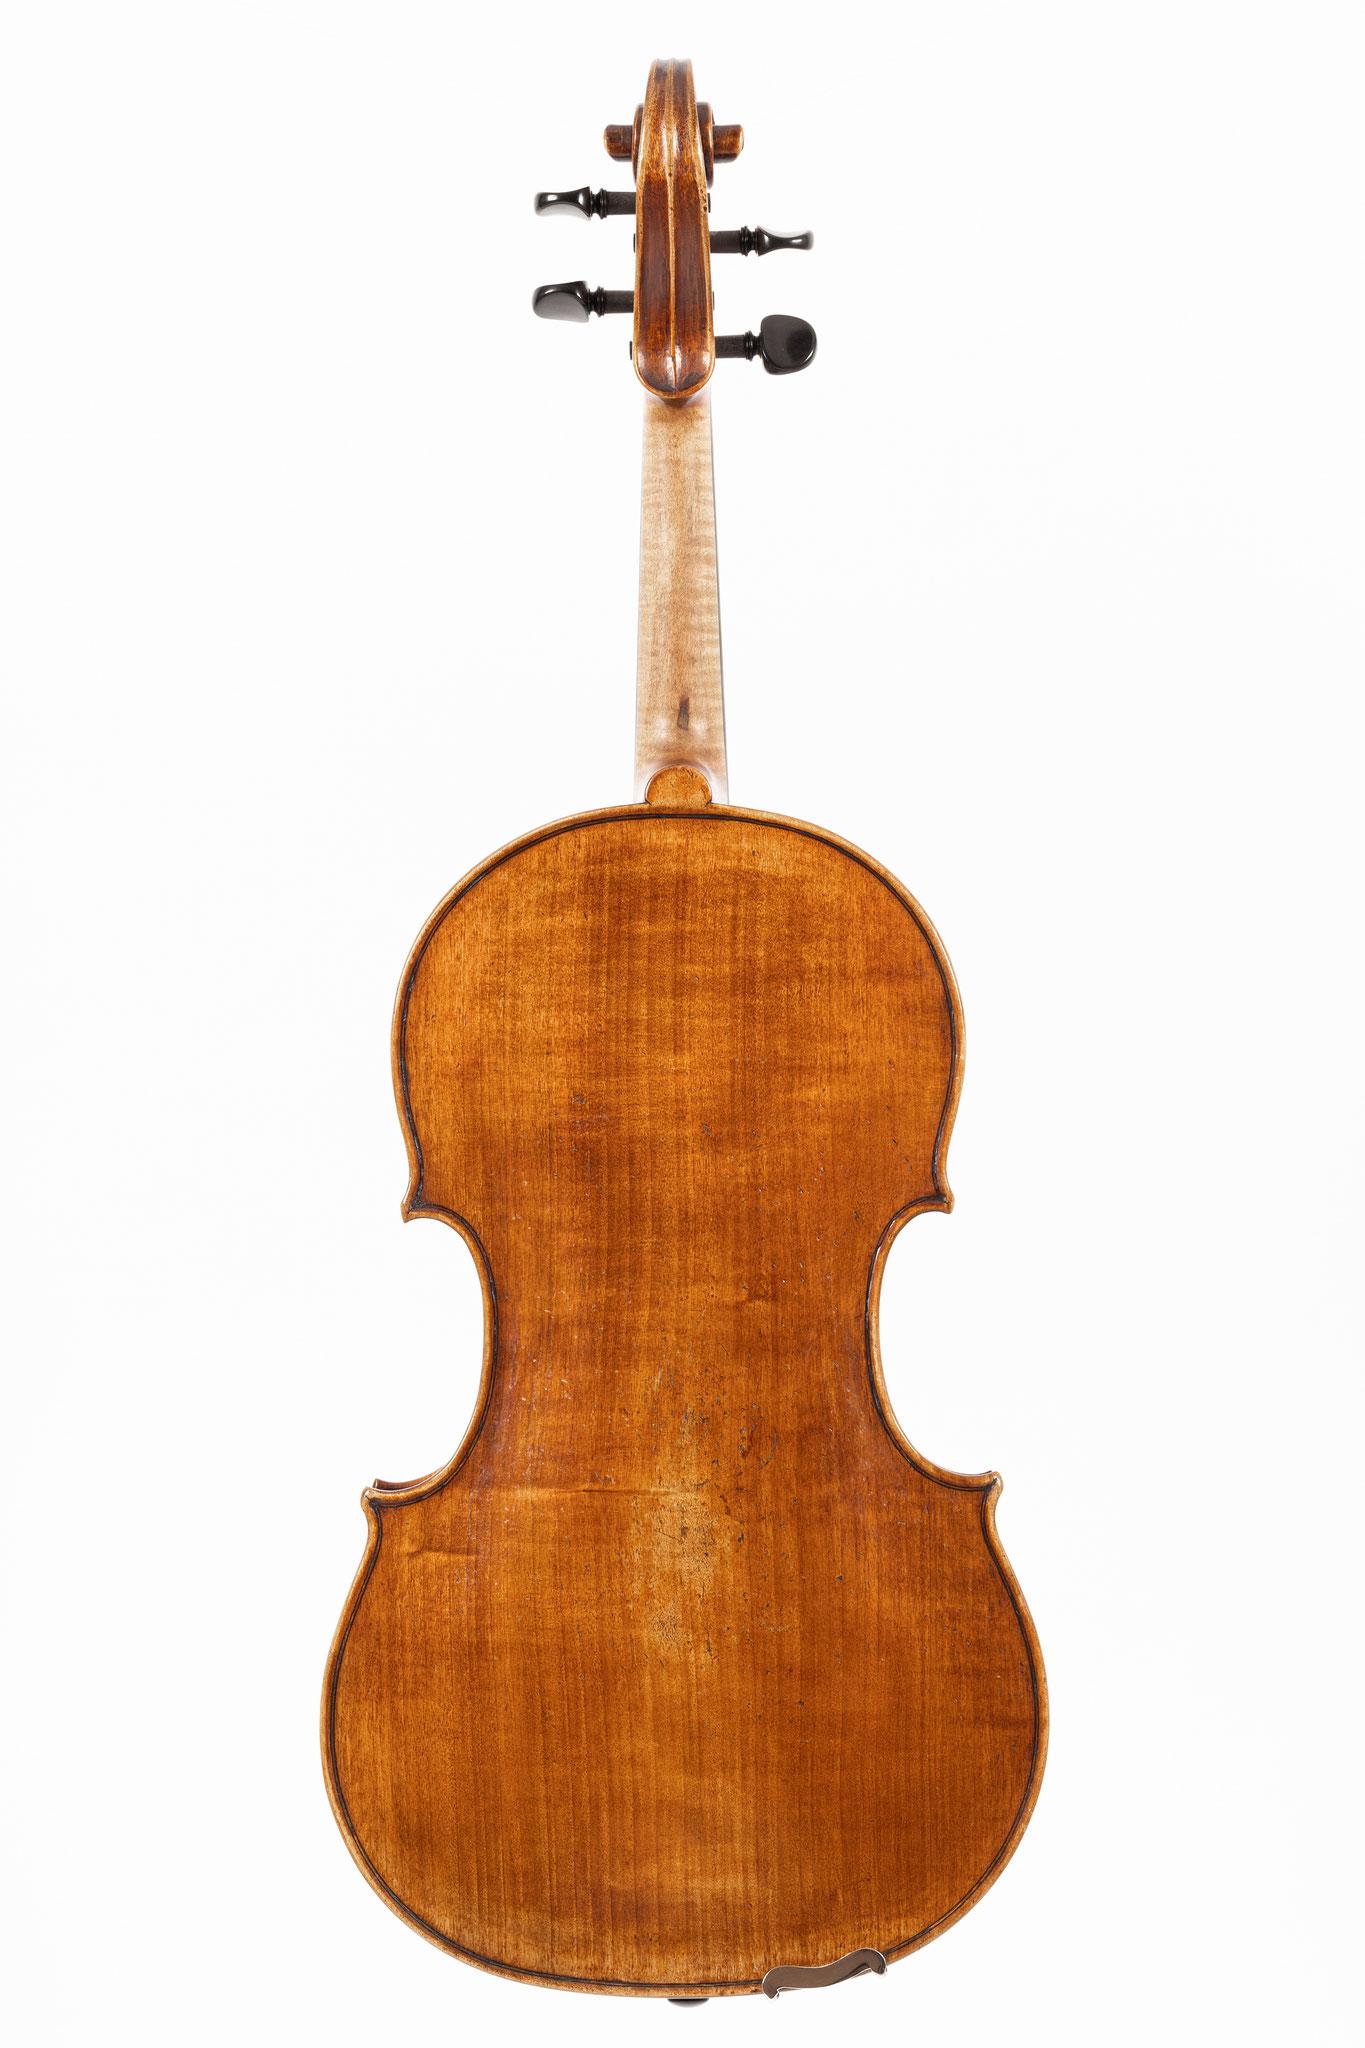 Viola im Stil von Guarneri del Gesù (2020/CH), Photo: VDB Photography